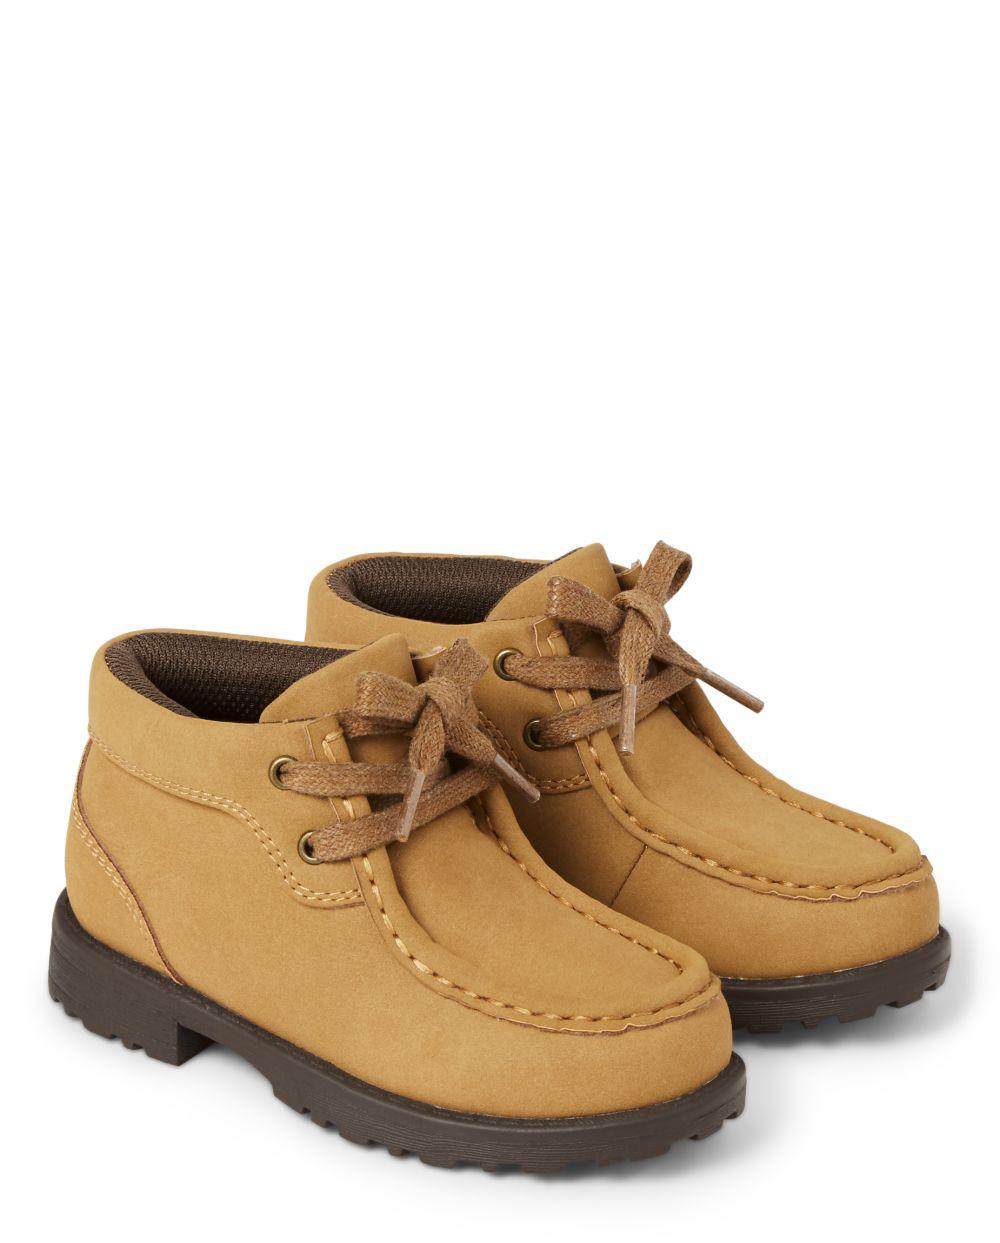 Boys Boots - Harvest